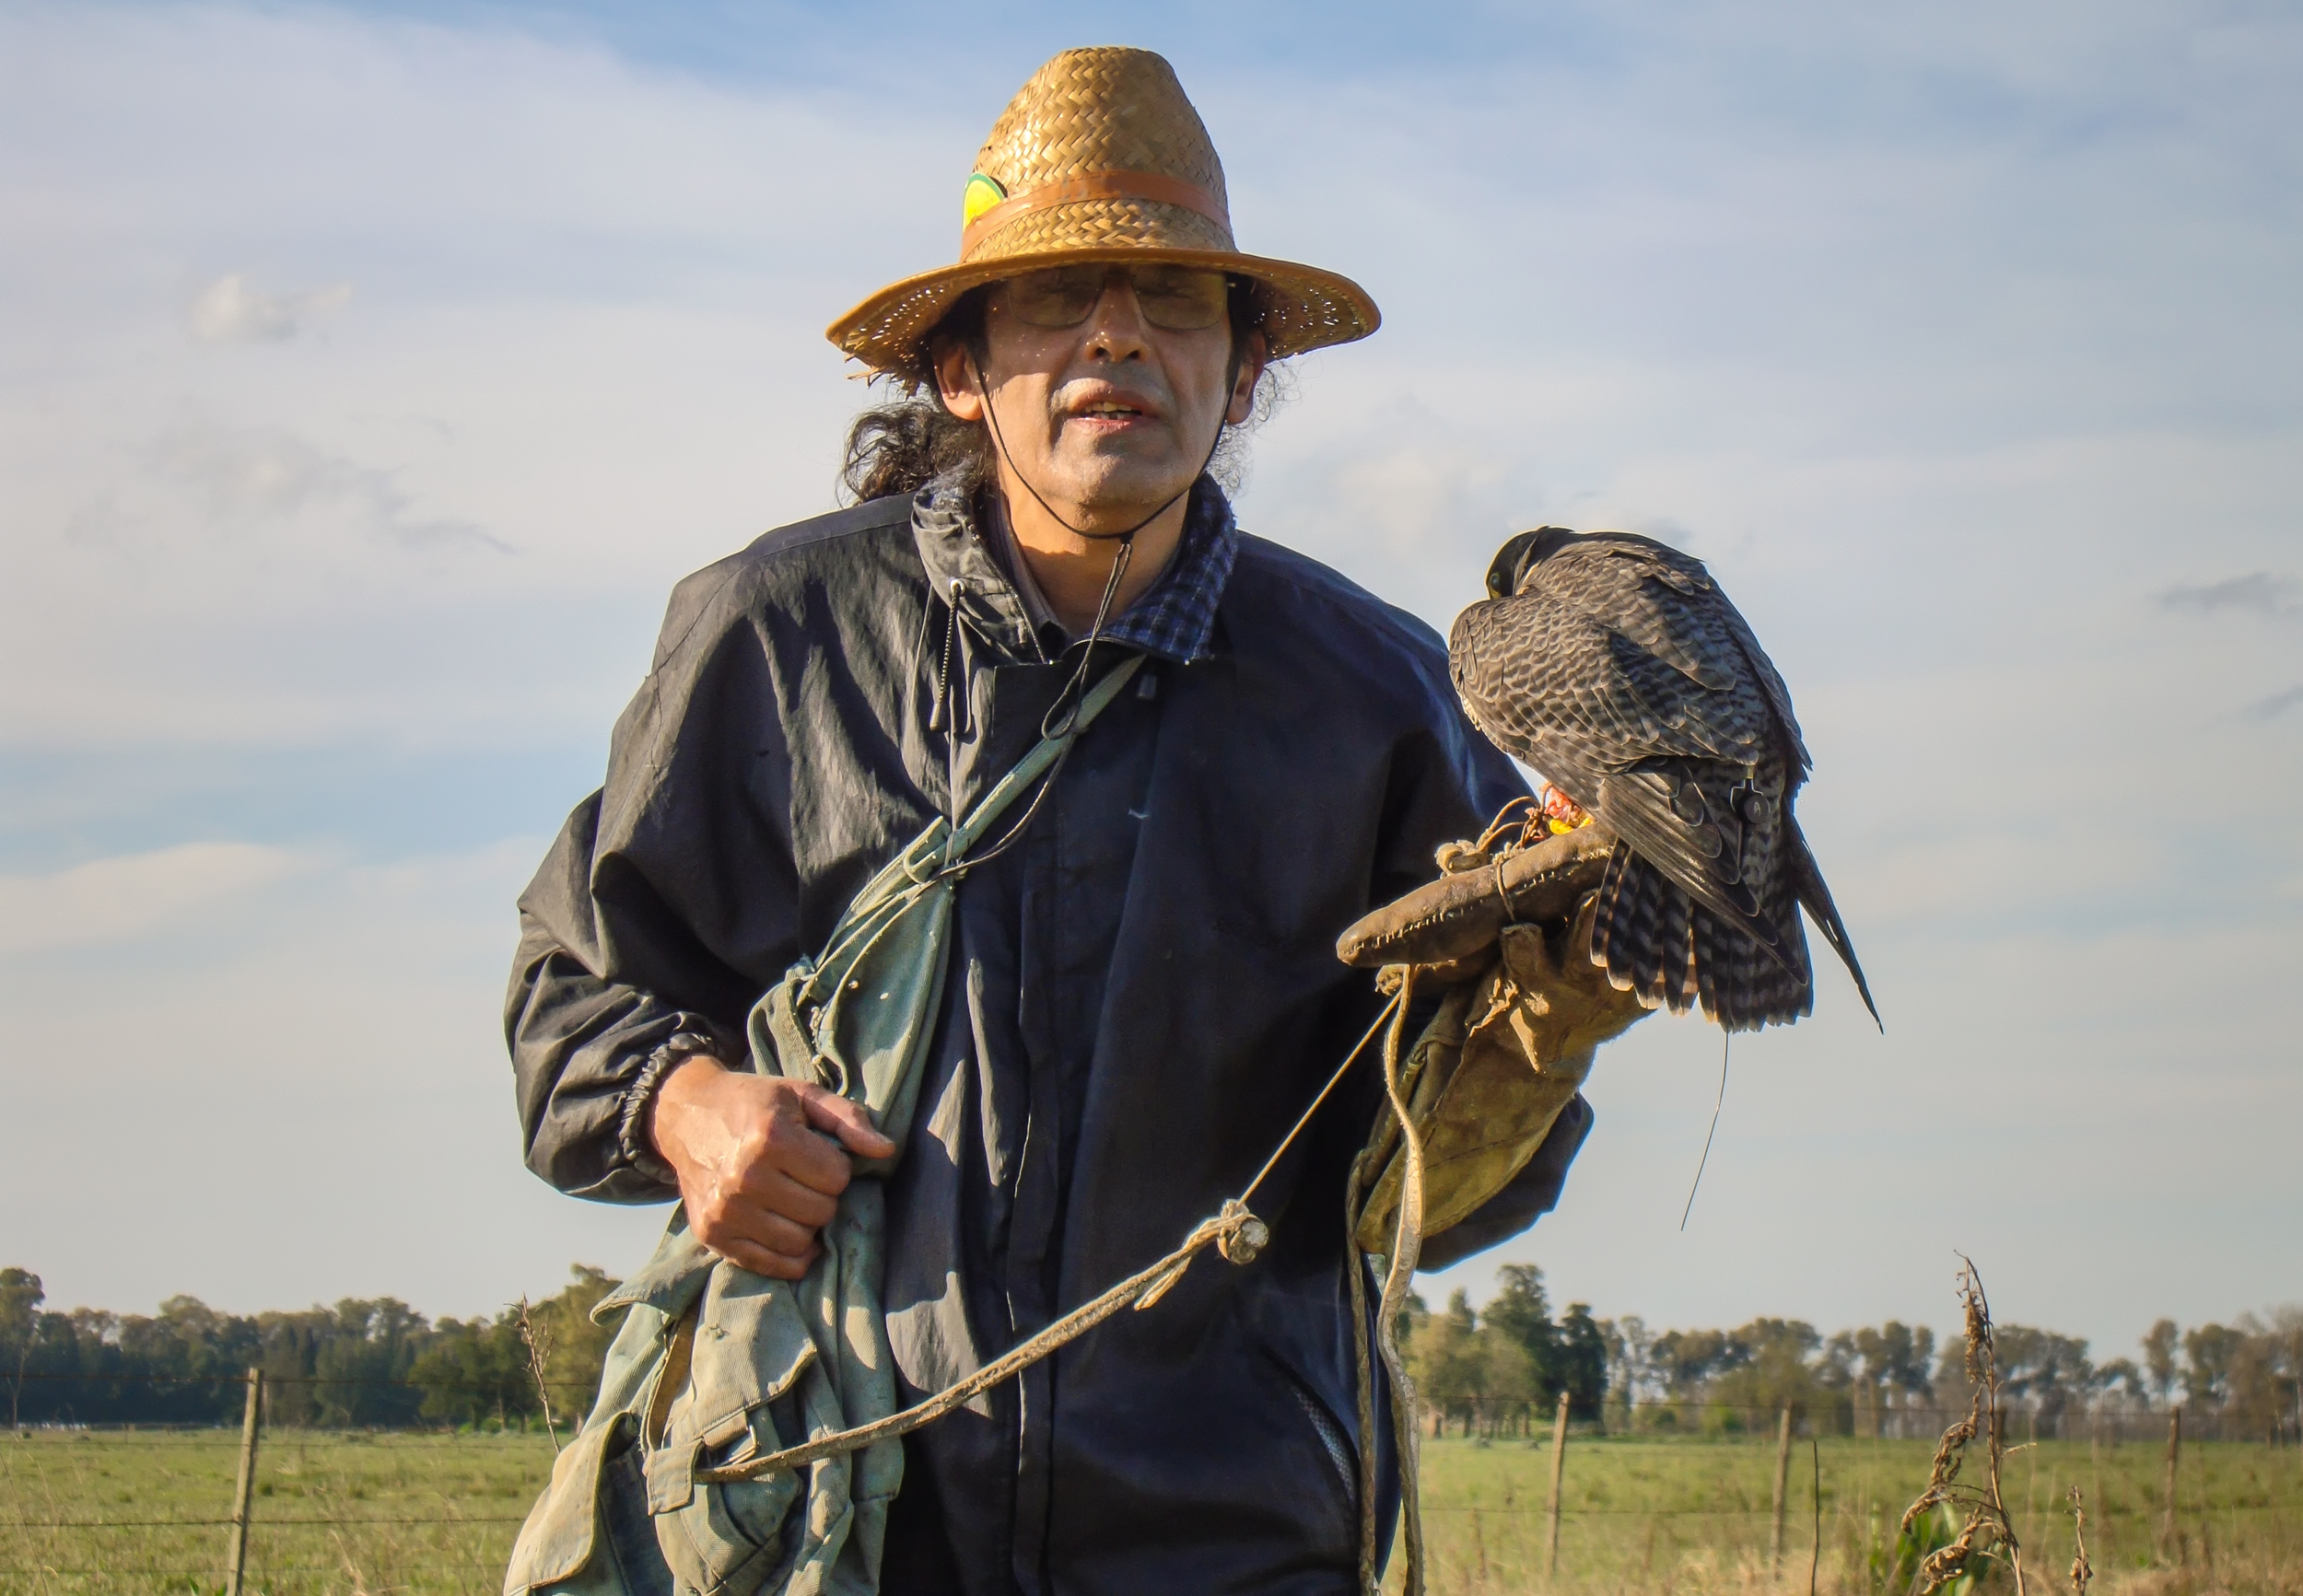 Ricardo soule con halcon peregrino A